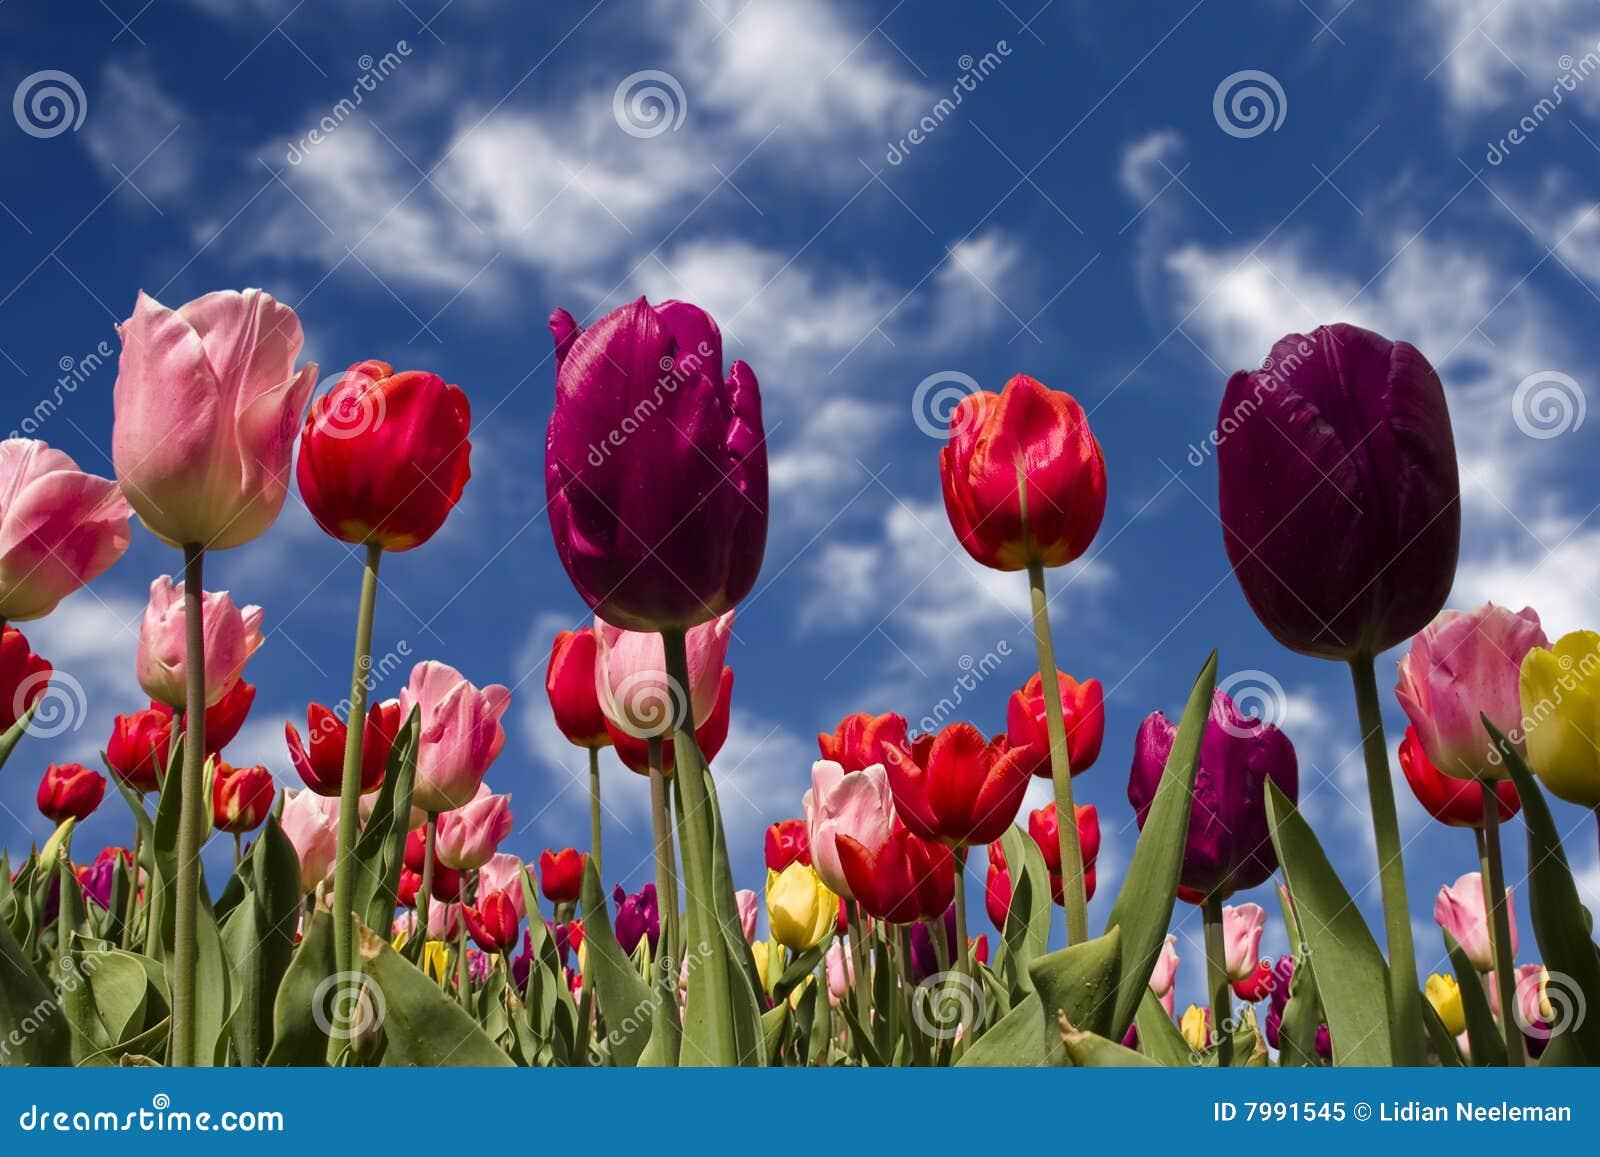 jardin de tulipes au printemps image stock image du b ti fleur 7991545. Black Bedroom Furniture Sets. Home Design Ideas